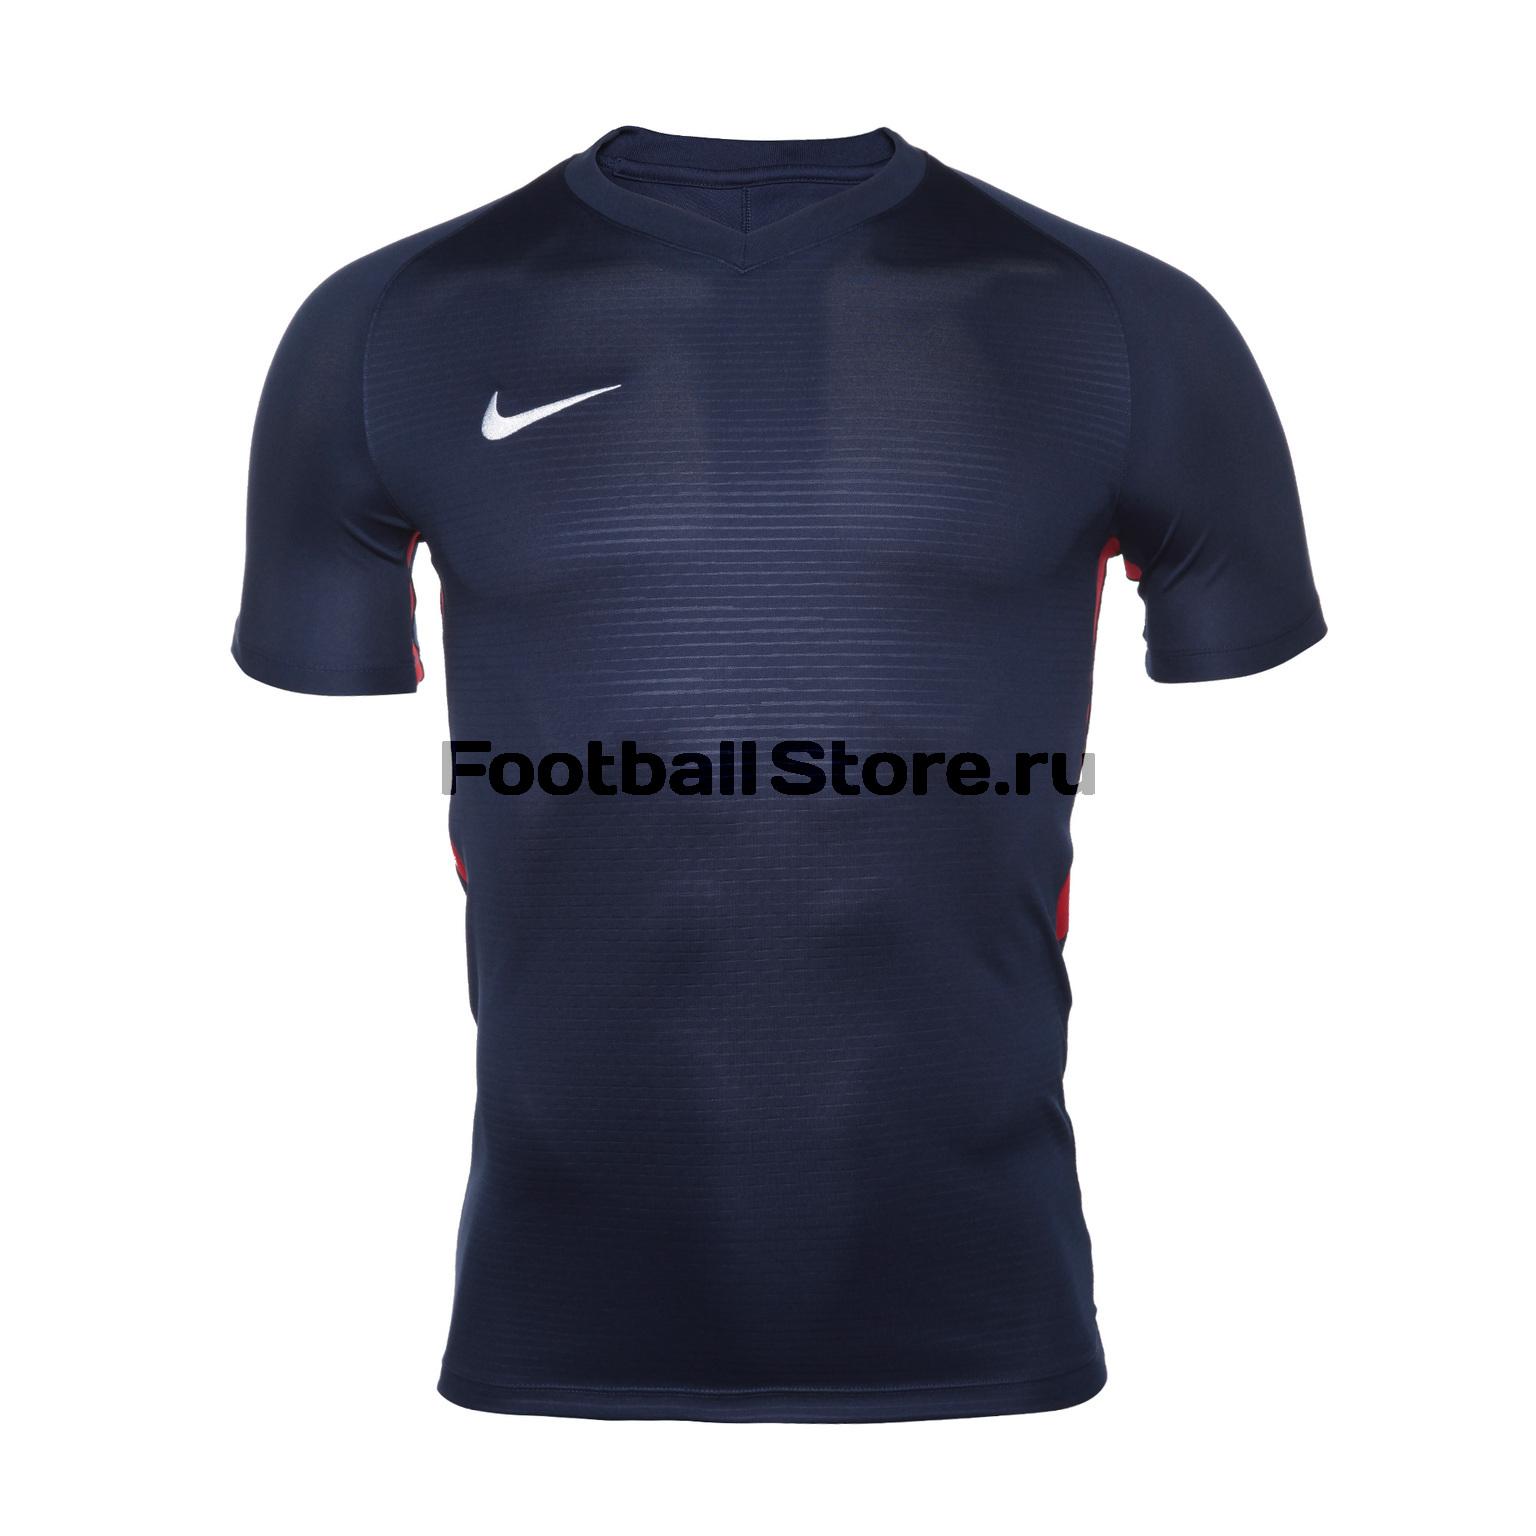 Футболка игровая Nike Dry Tiempo Prem JSY SS 894230-410 футболка игровая nike dry tiempo prem jsy ss 894230 662